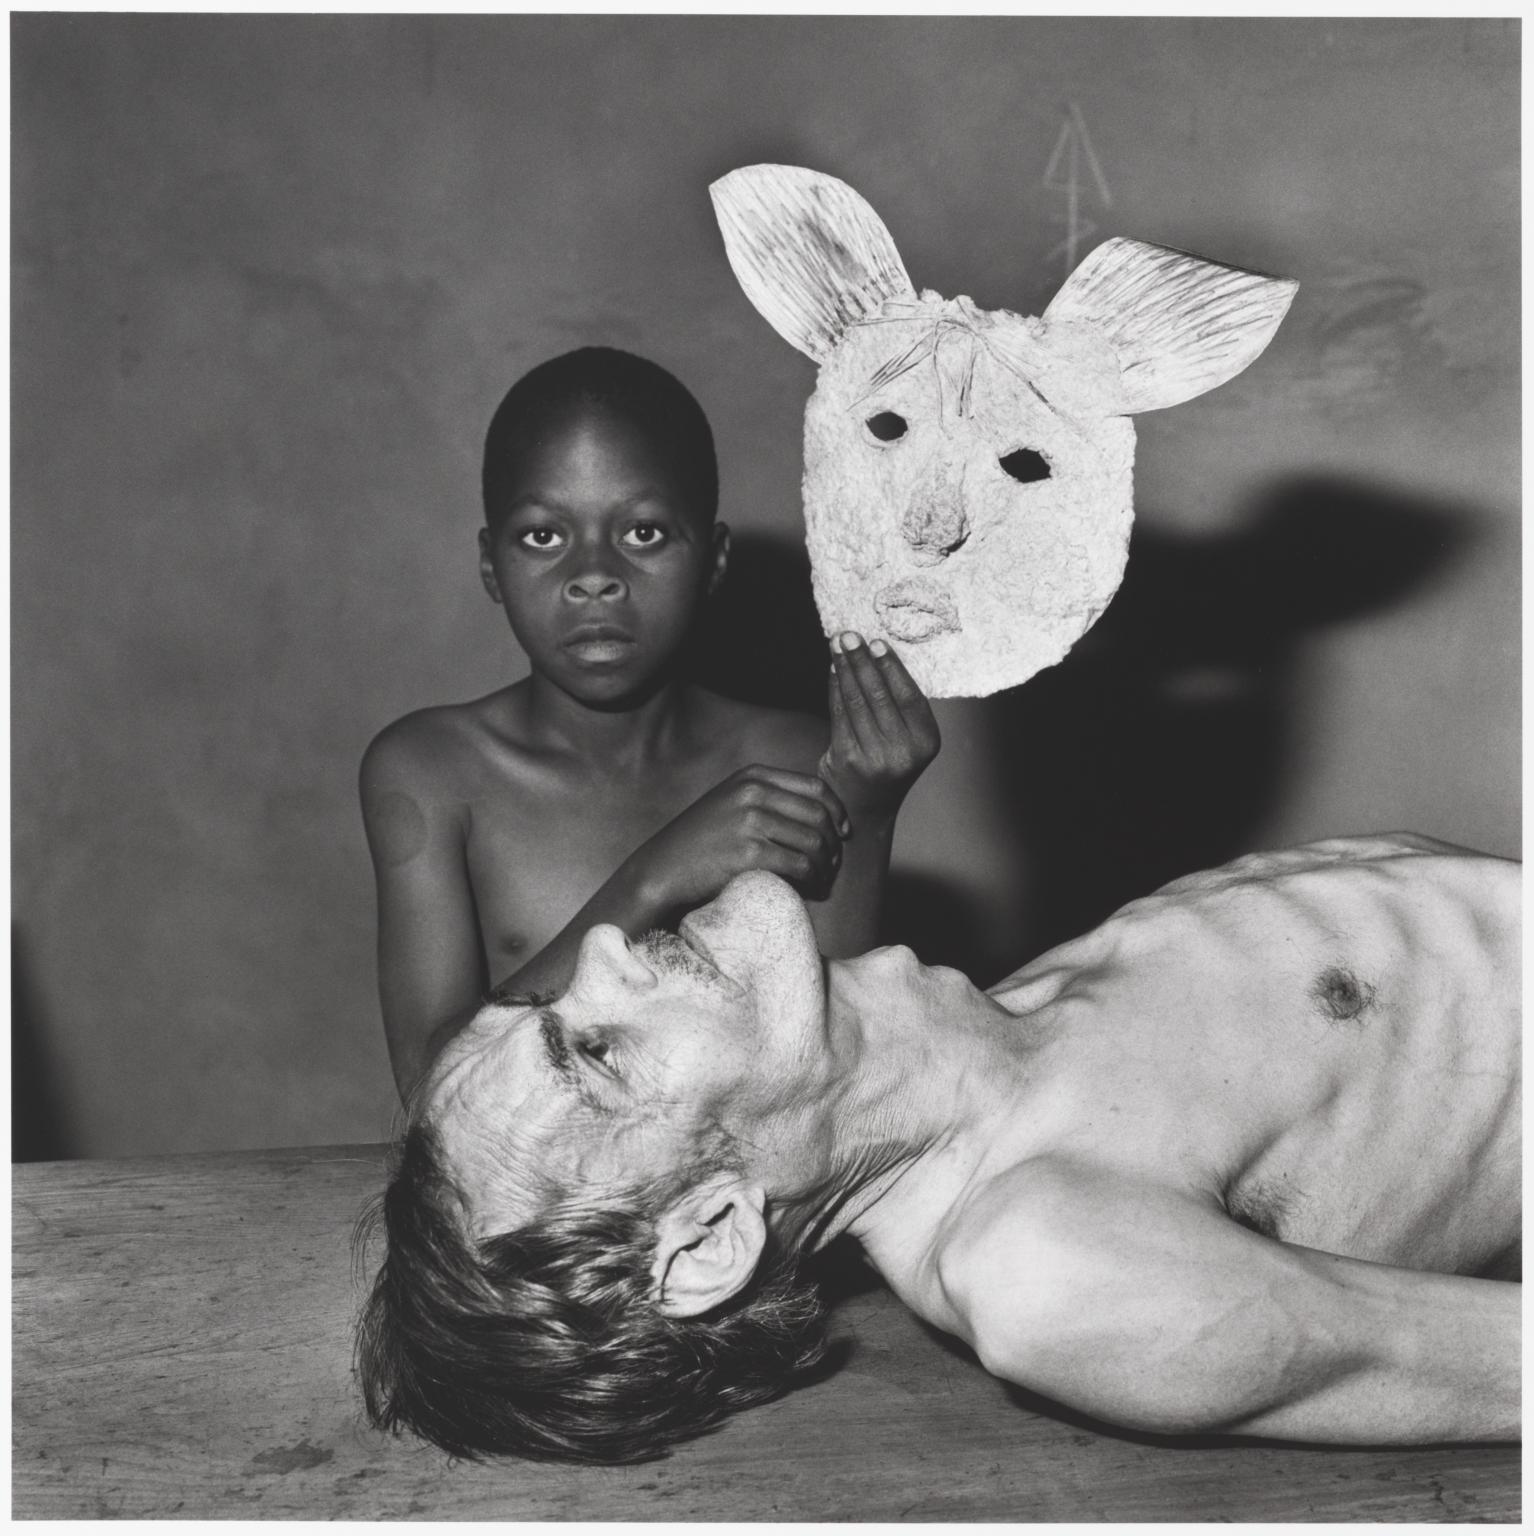 ROGER BALLEN, Tommy, Samson and a Mask, 2000